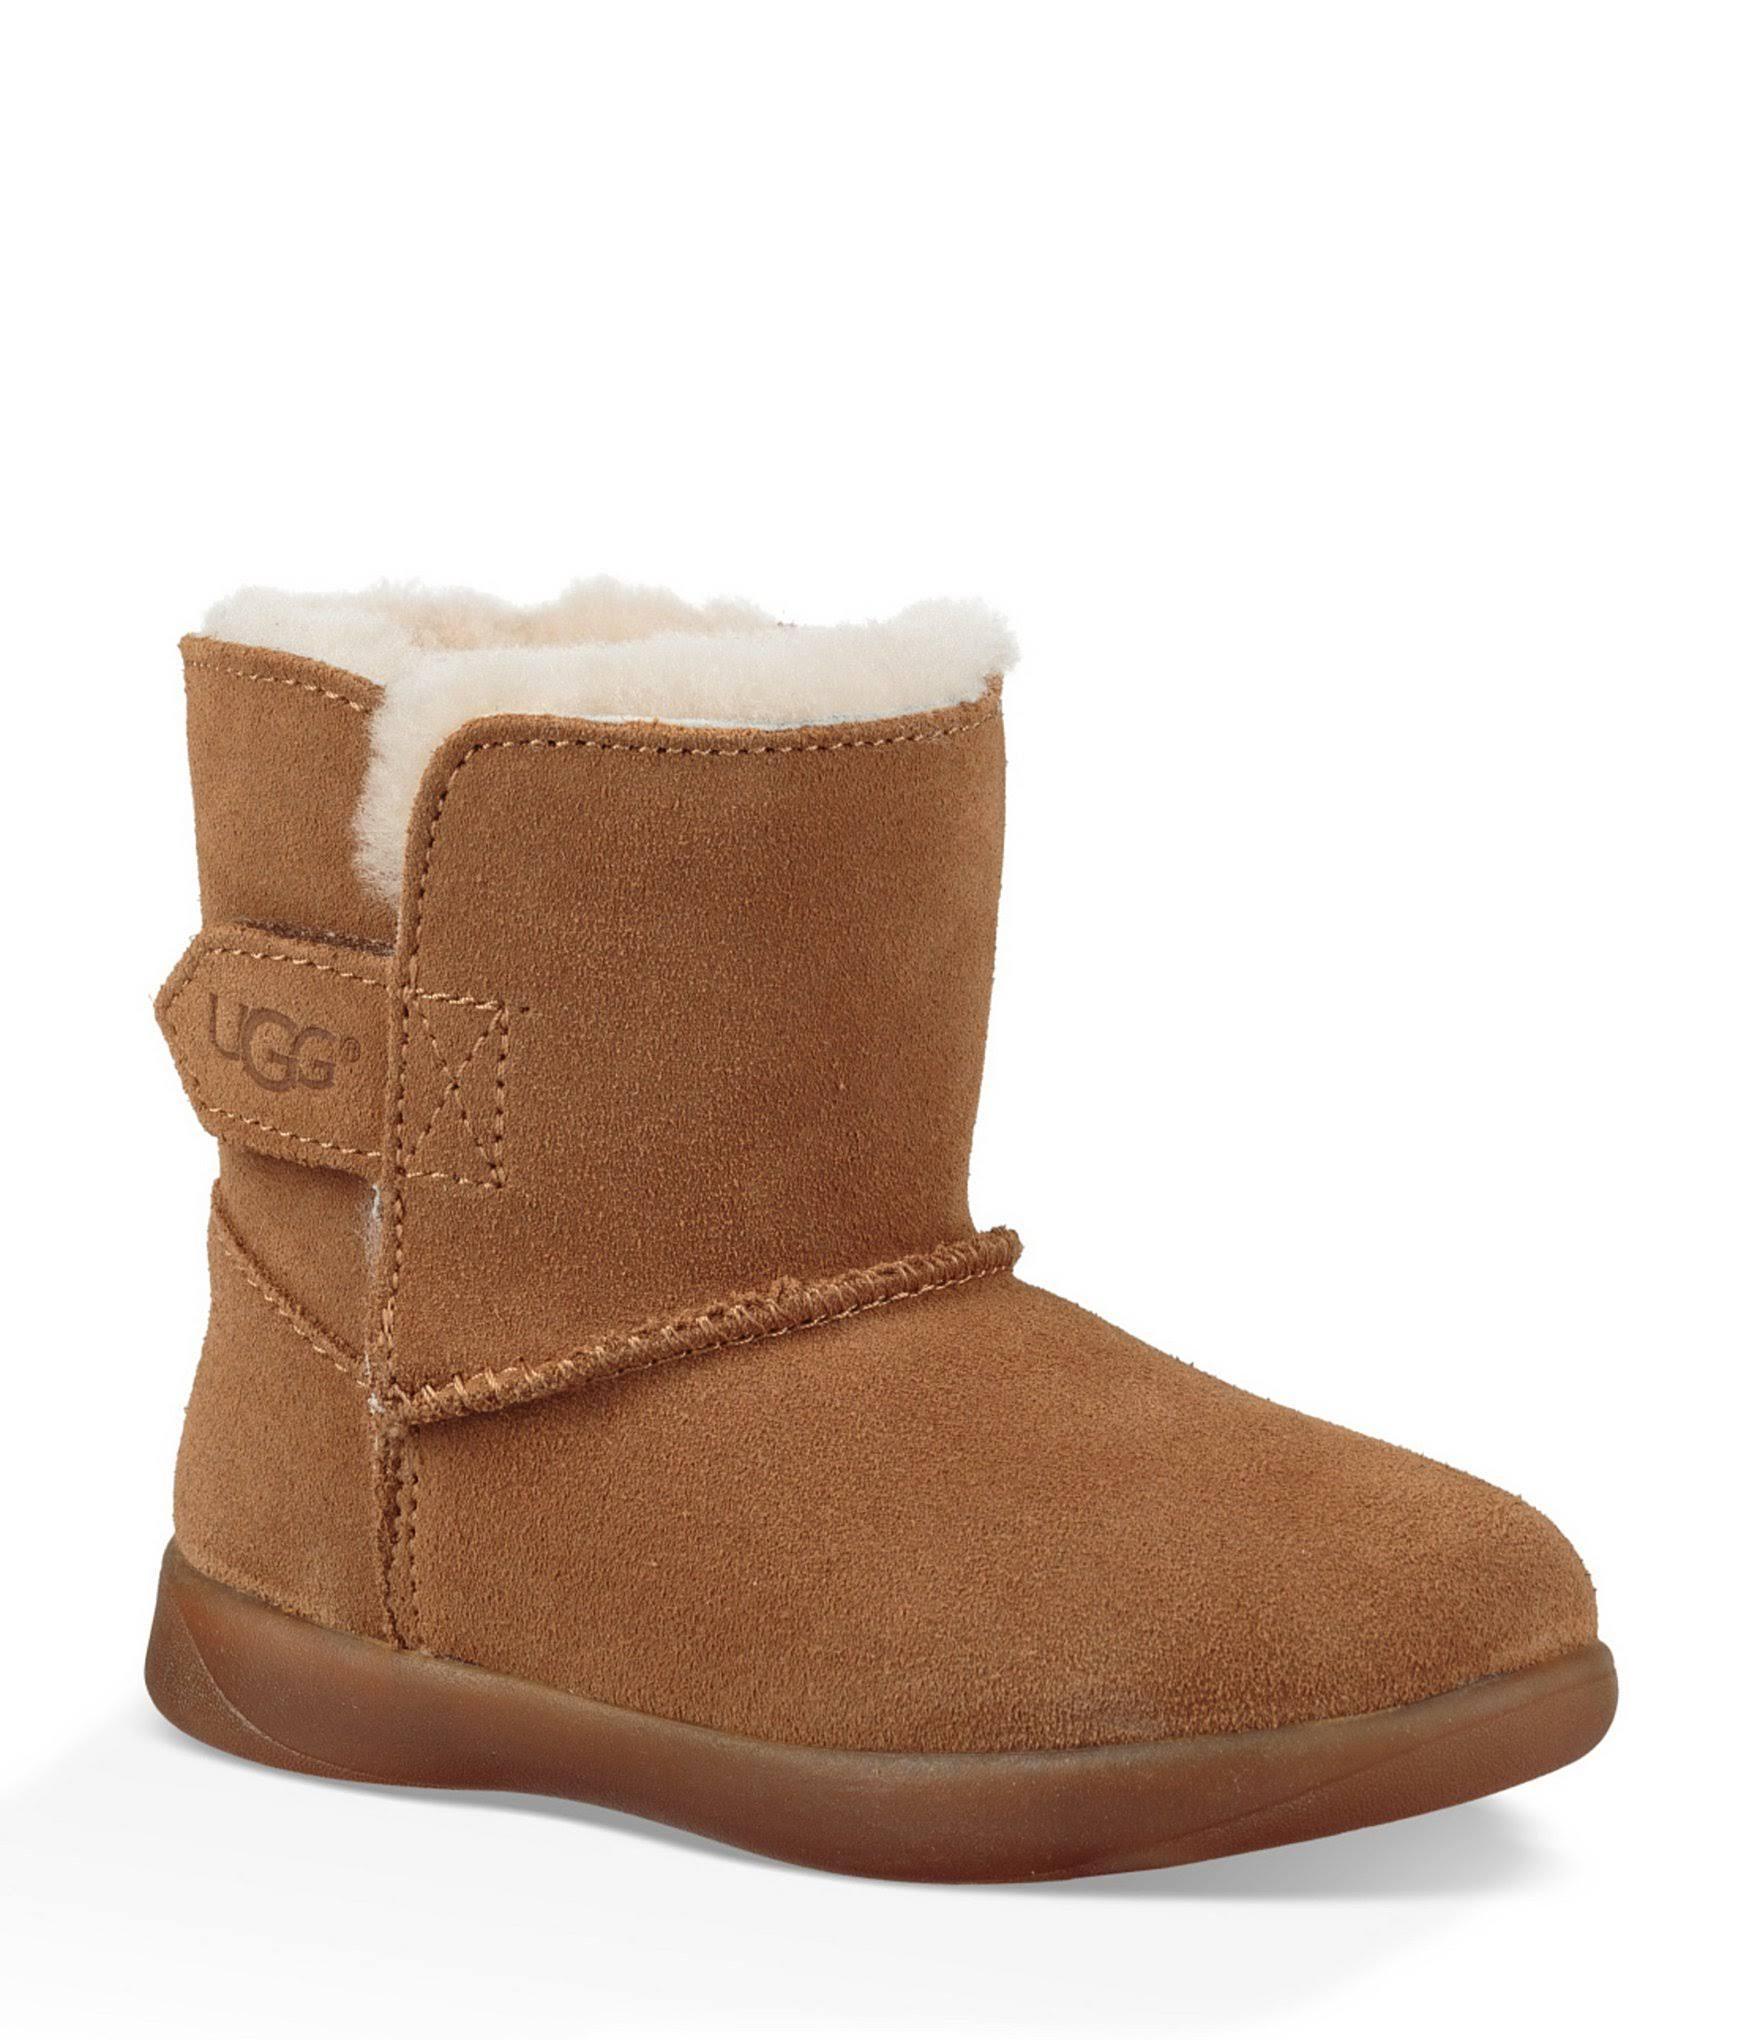 Keelan Baby Ugg Boot Chestnut Keelan Ugg Chestnut Baby Boot YWID29EH